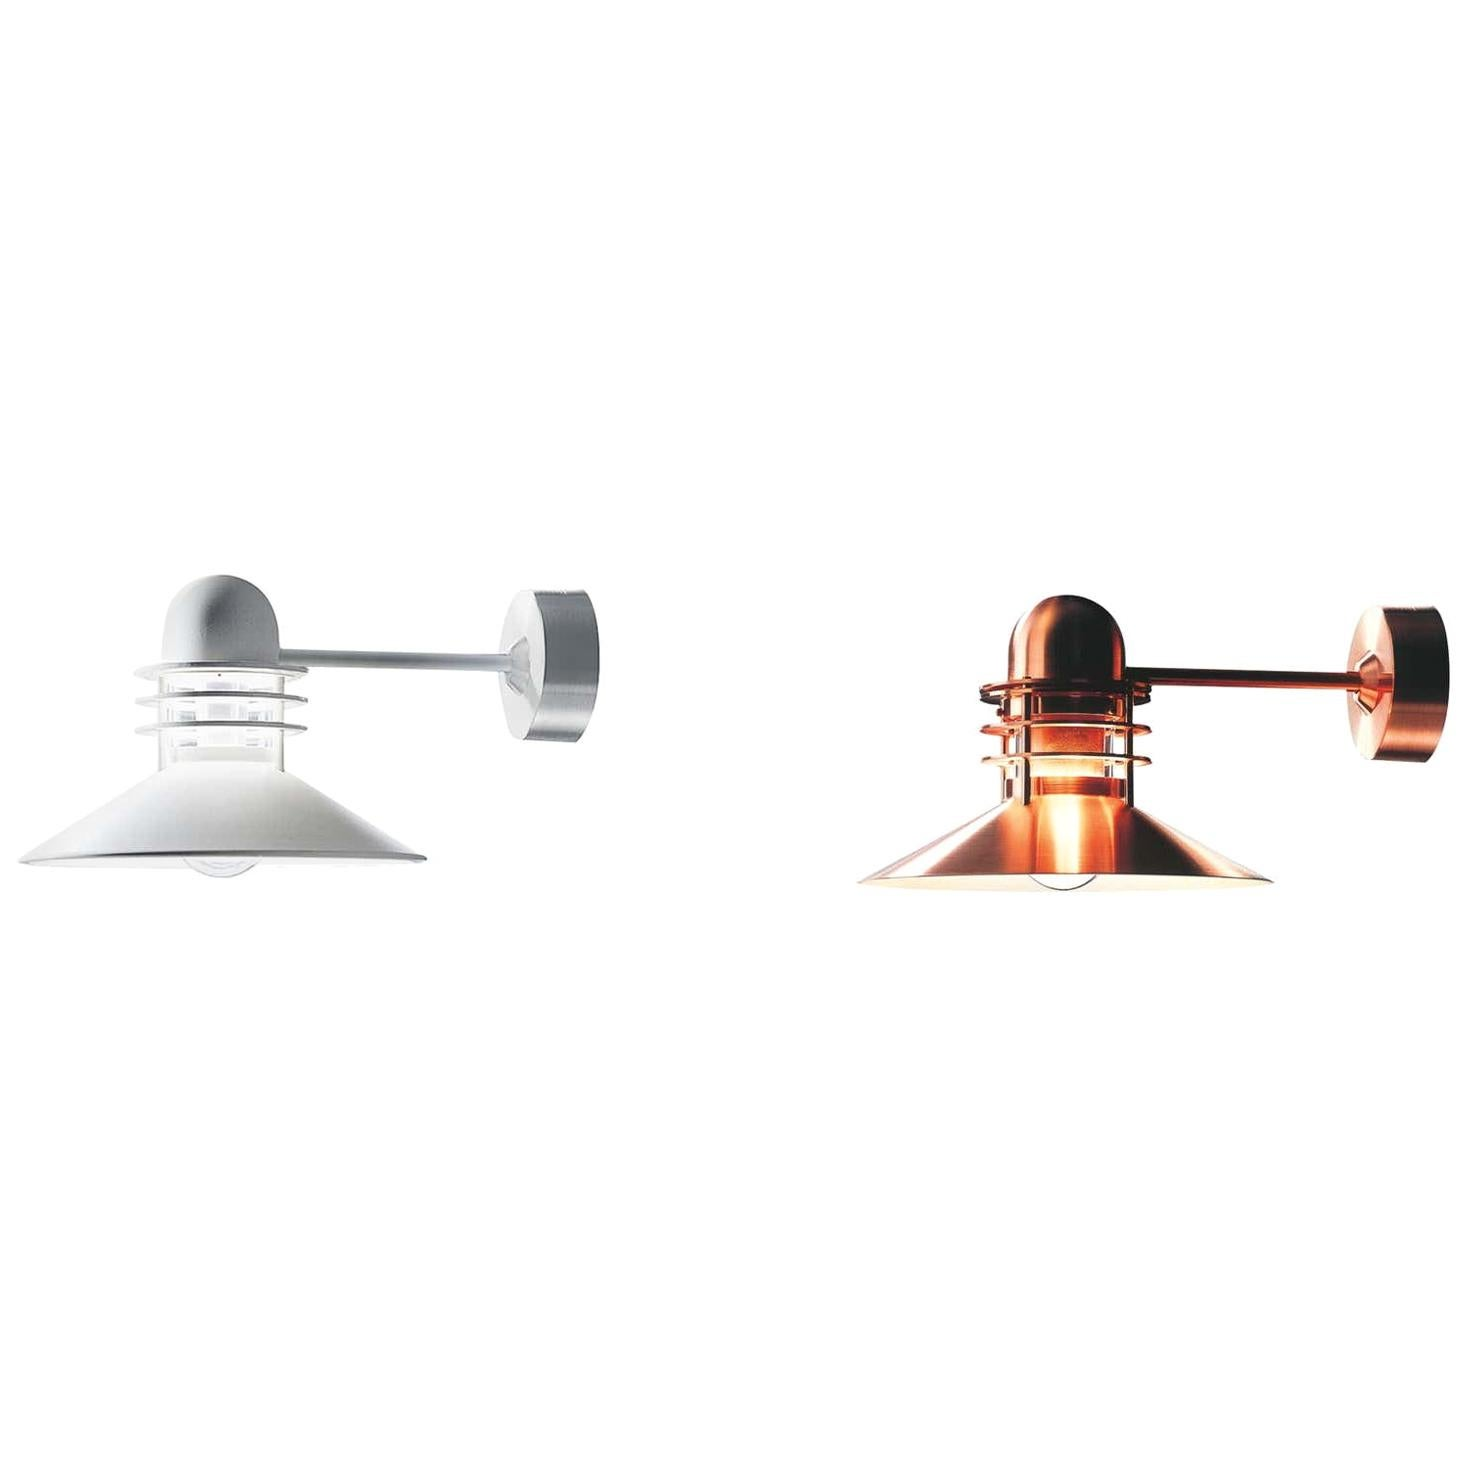 Louis Poulsen, Outdoor Wall Lamp by Alfred Homann & Ole V. Kjær